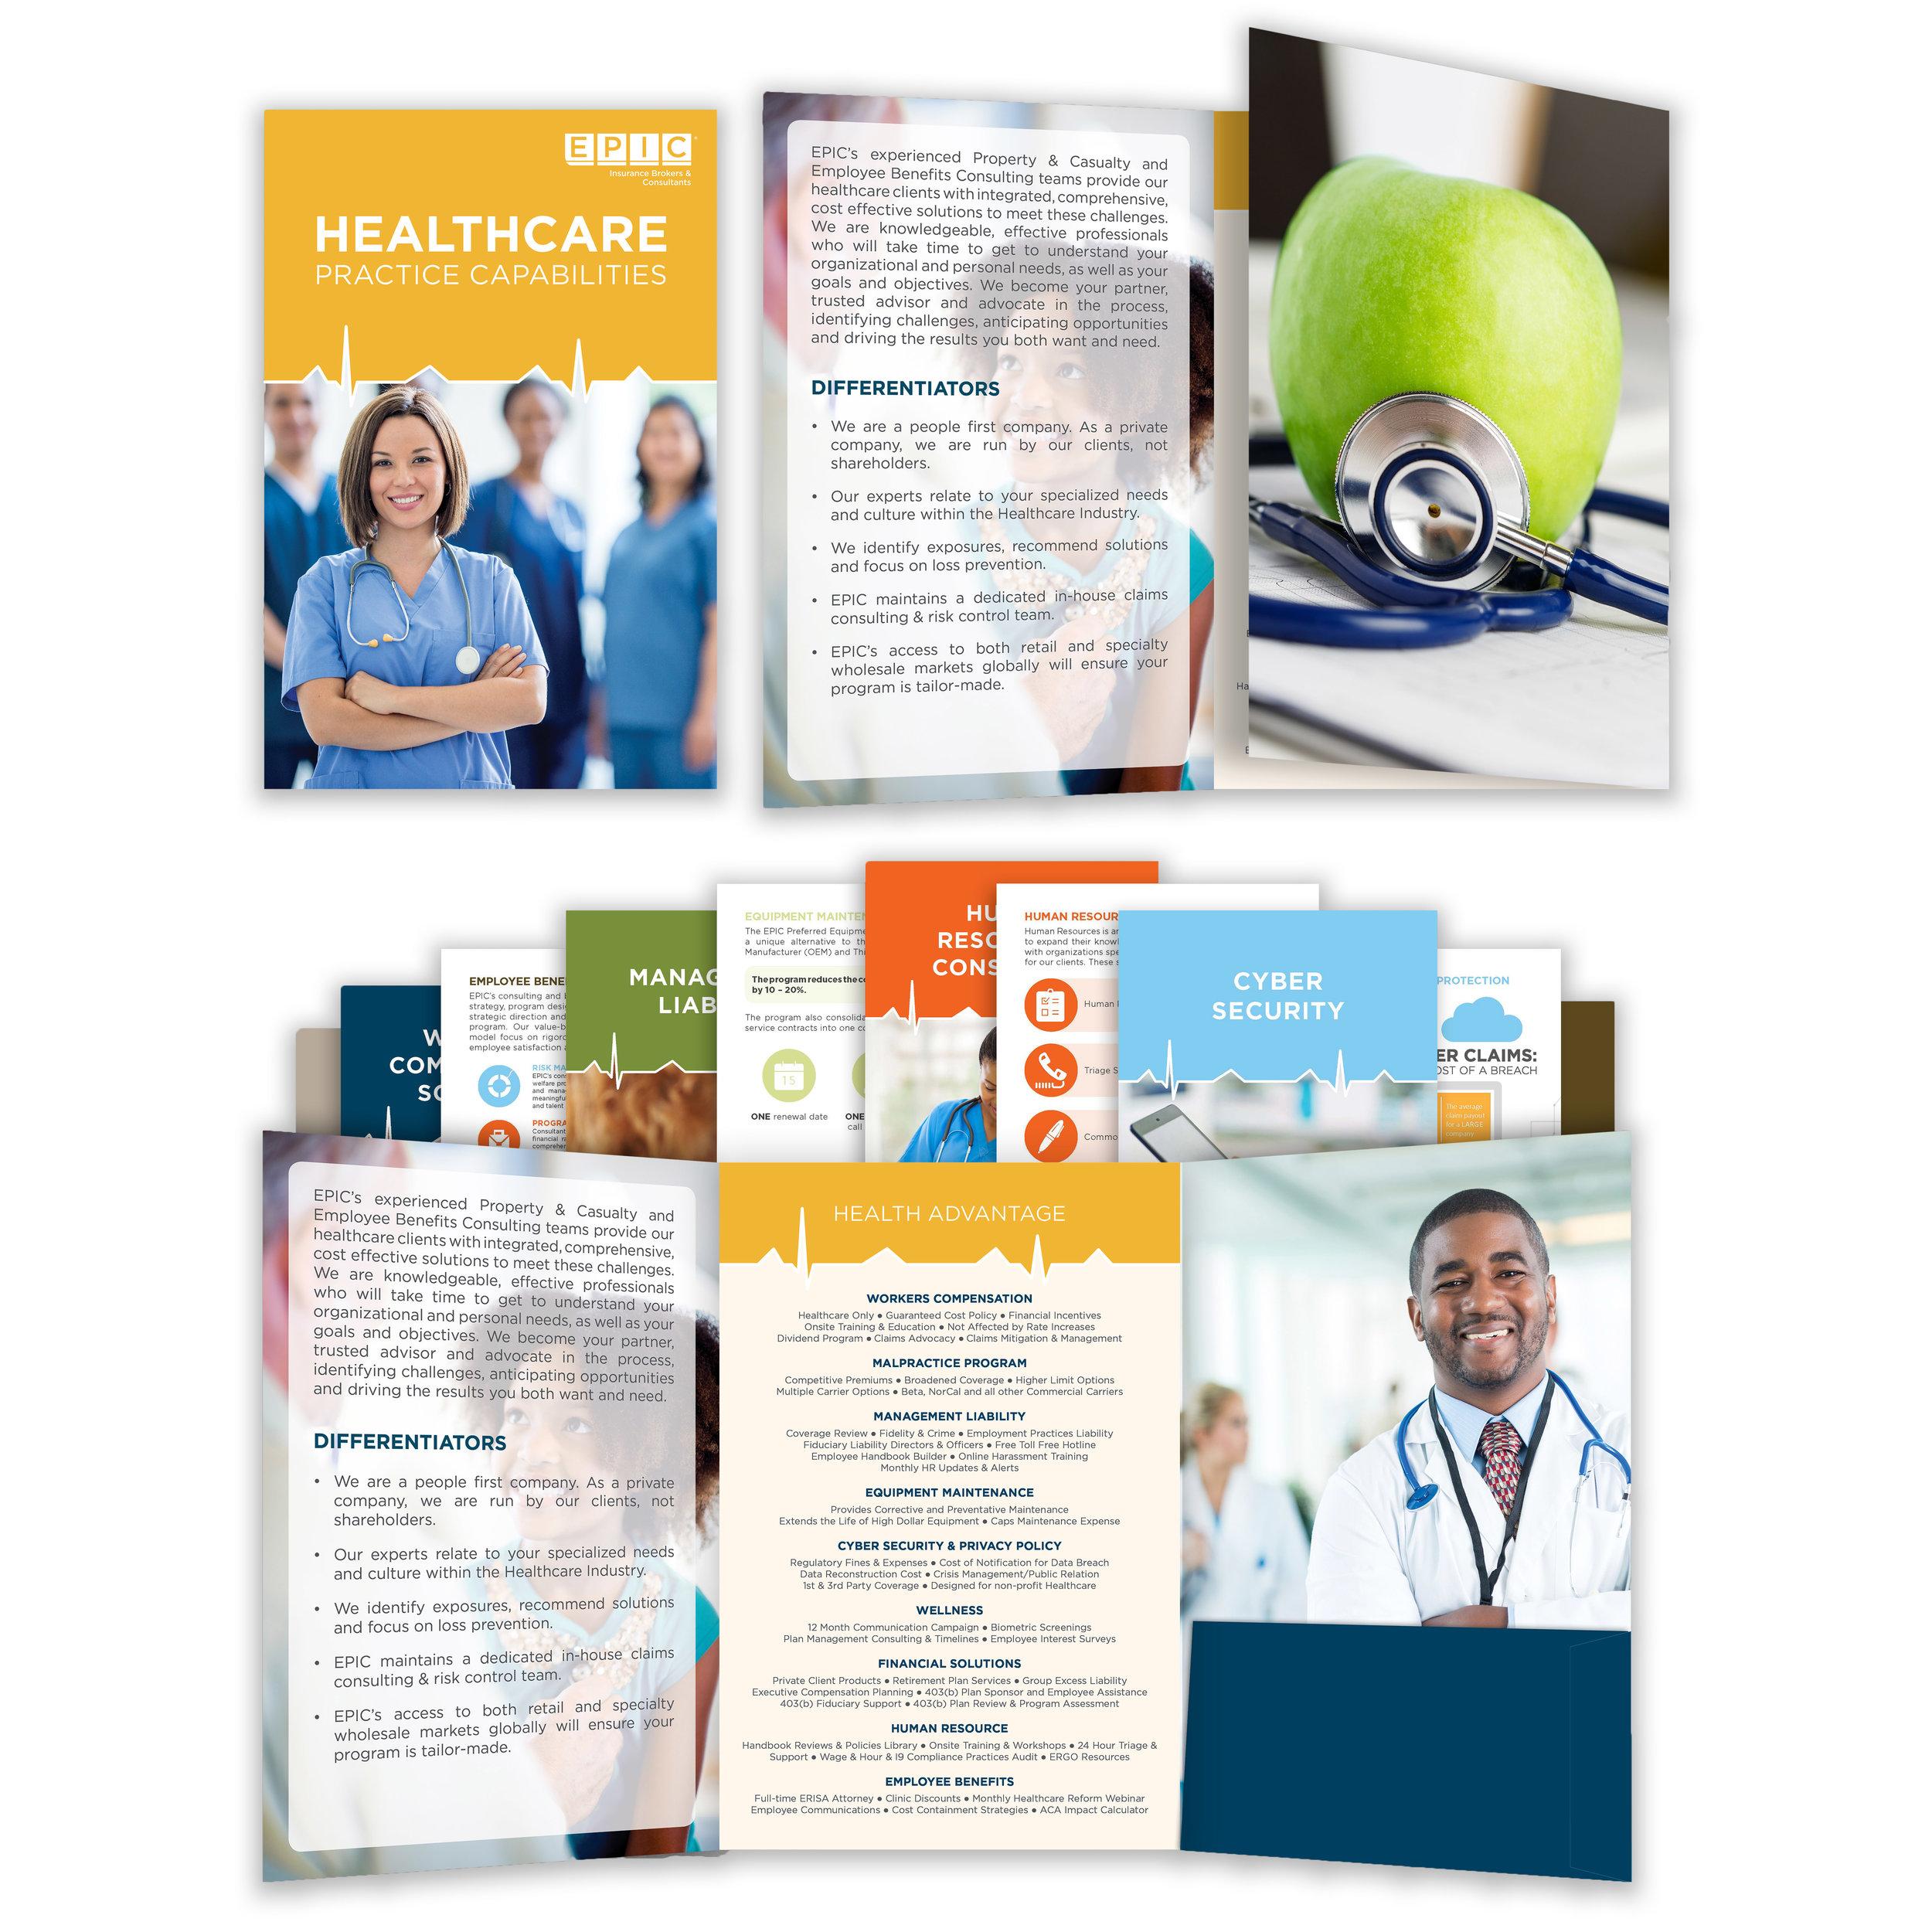 Healthcare-Comp1_Resized.jpg